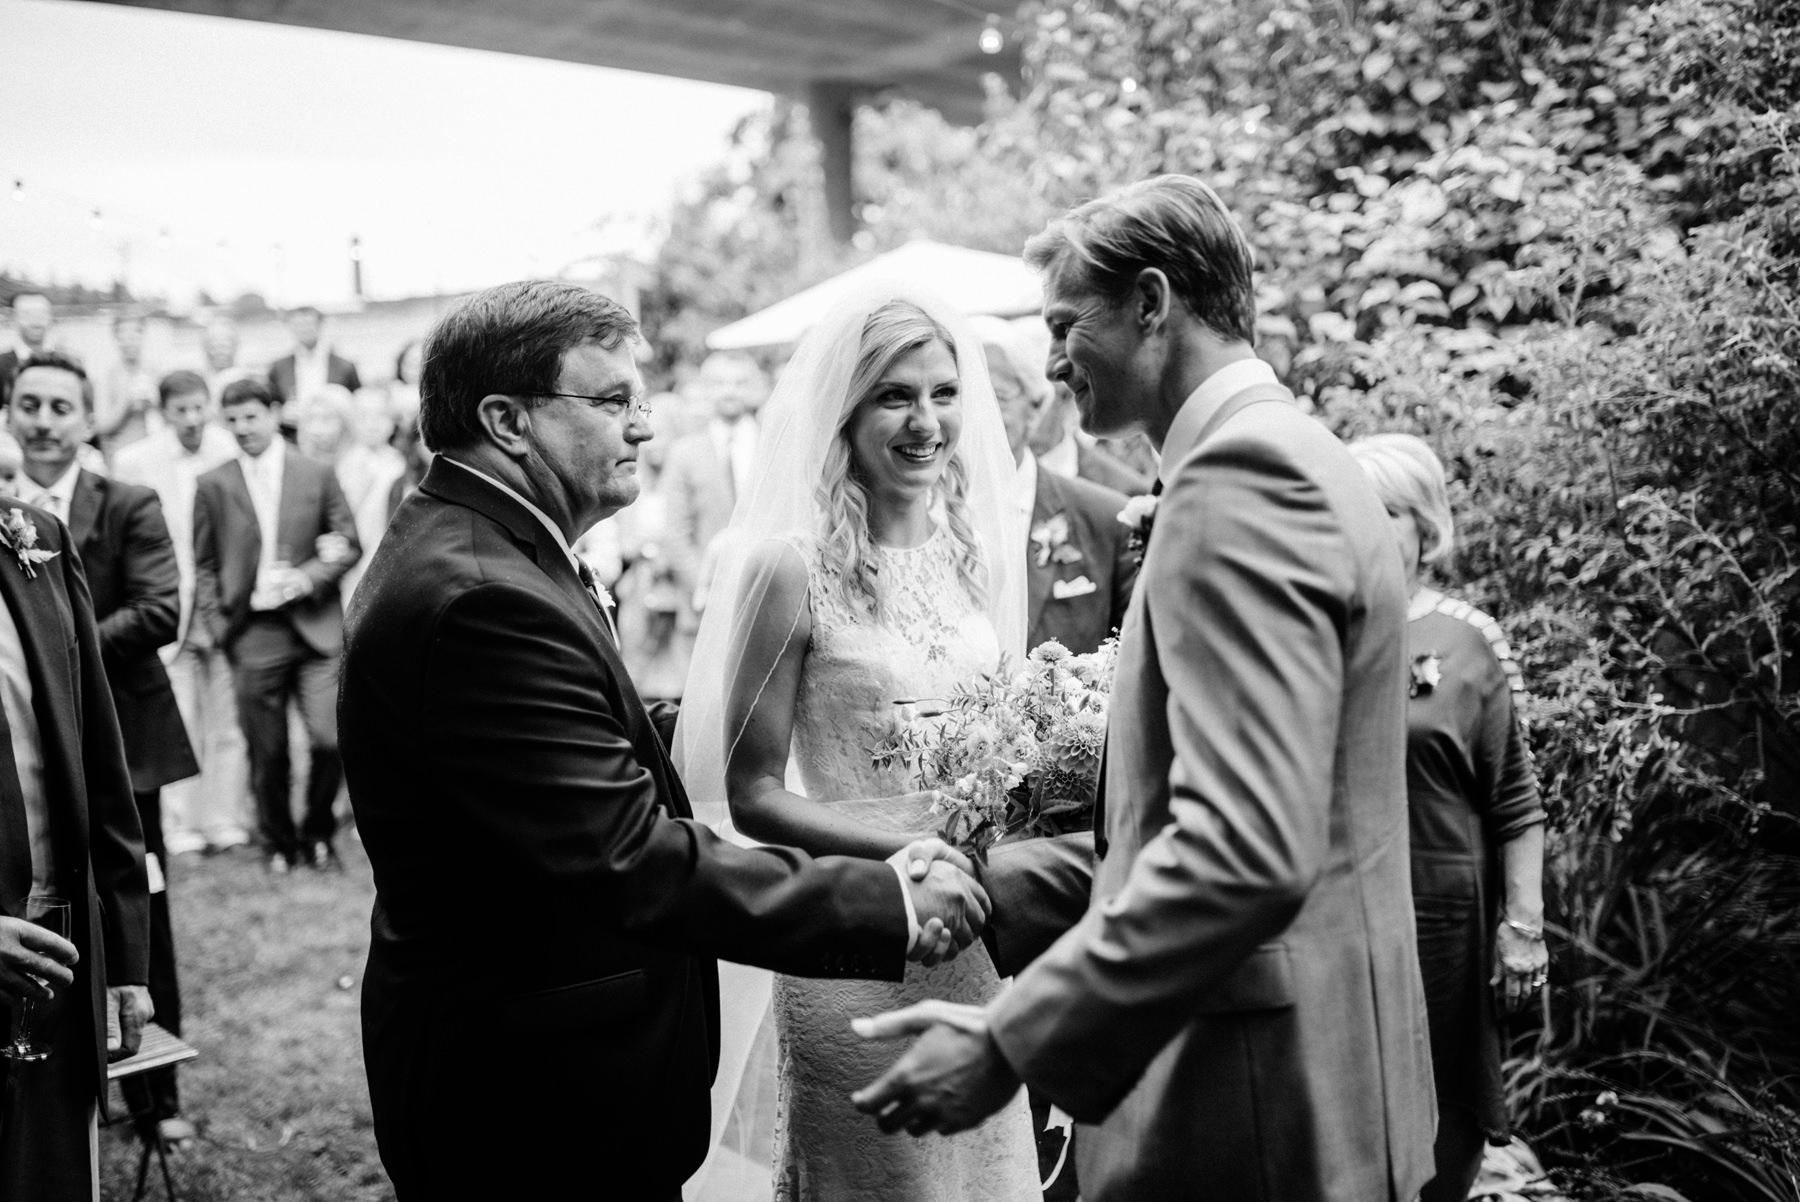 203-outdoor-wedding-ceremony-at-the-corson-building.jpg